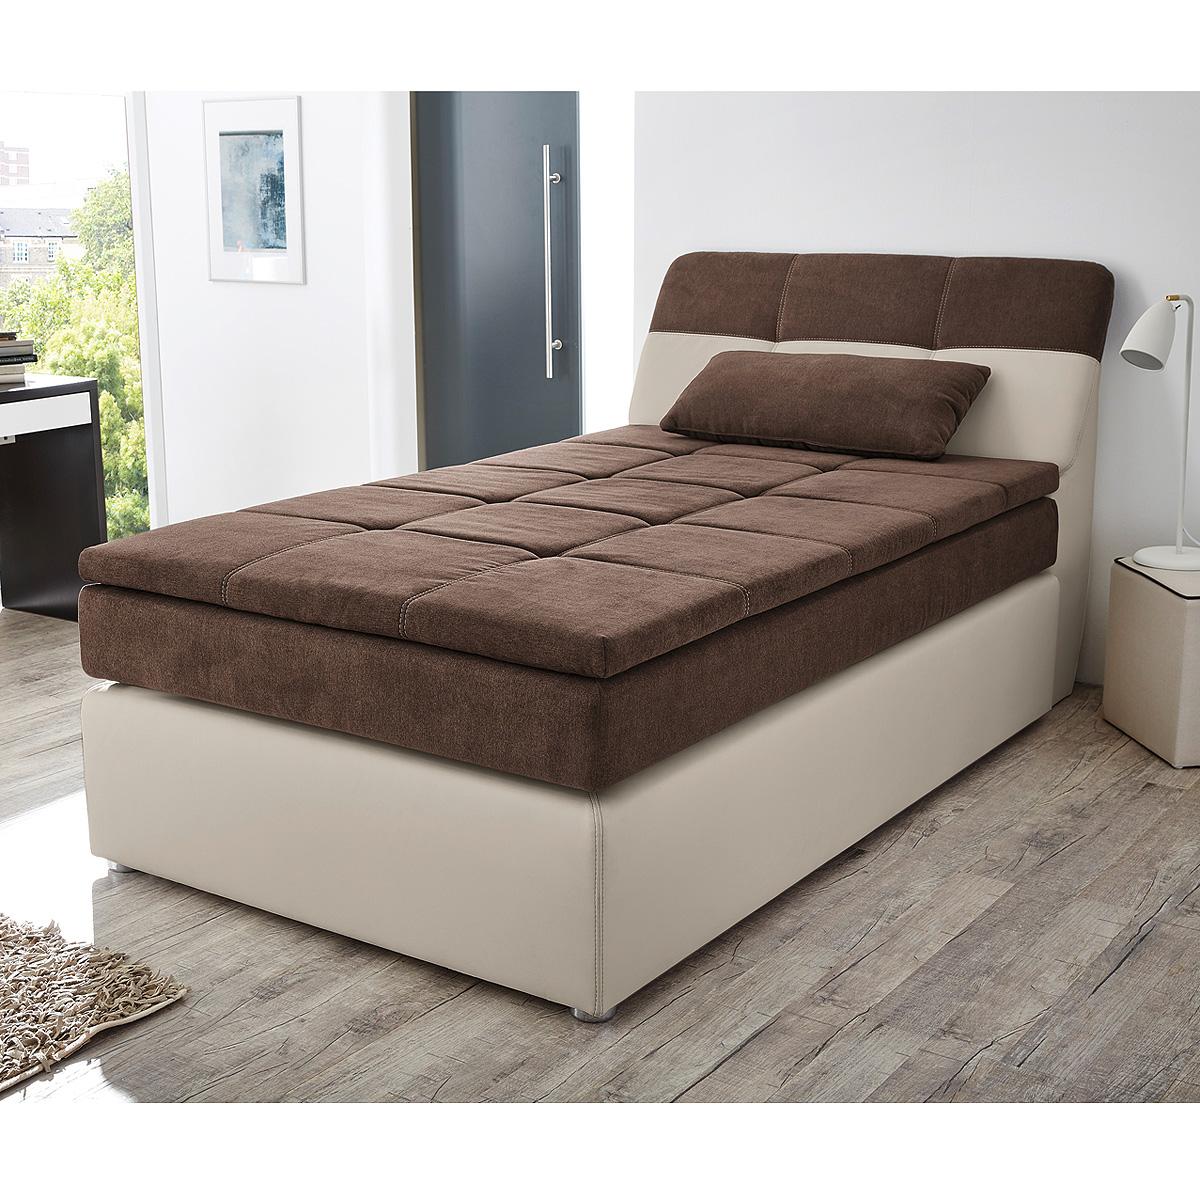 boxspringbett odessa schlafzimmerbett bett in greige braun. Black Bedroom Furniture Sets. Home Design Ideas